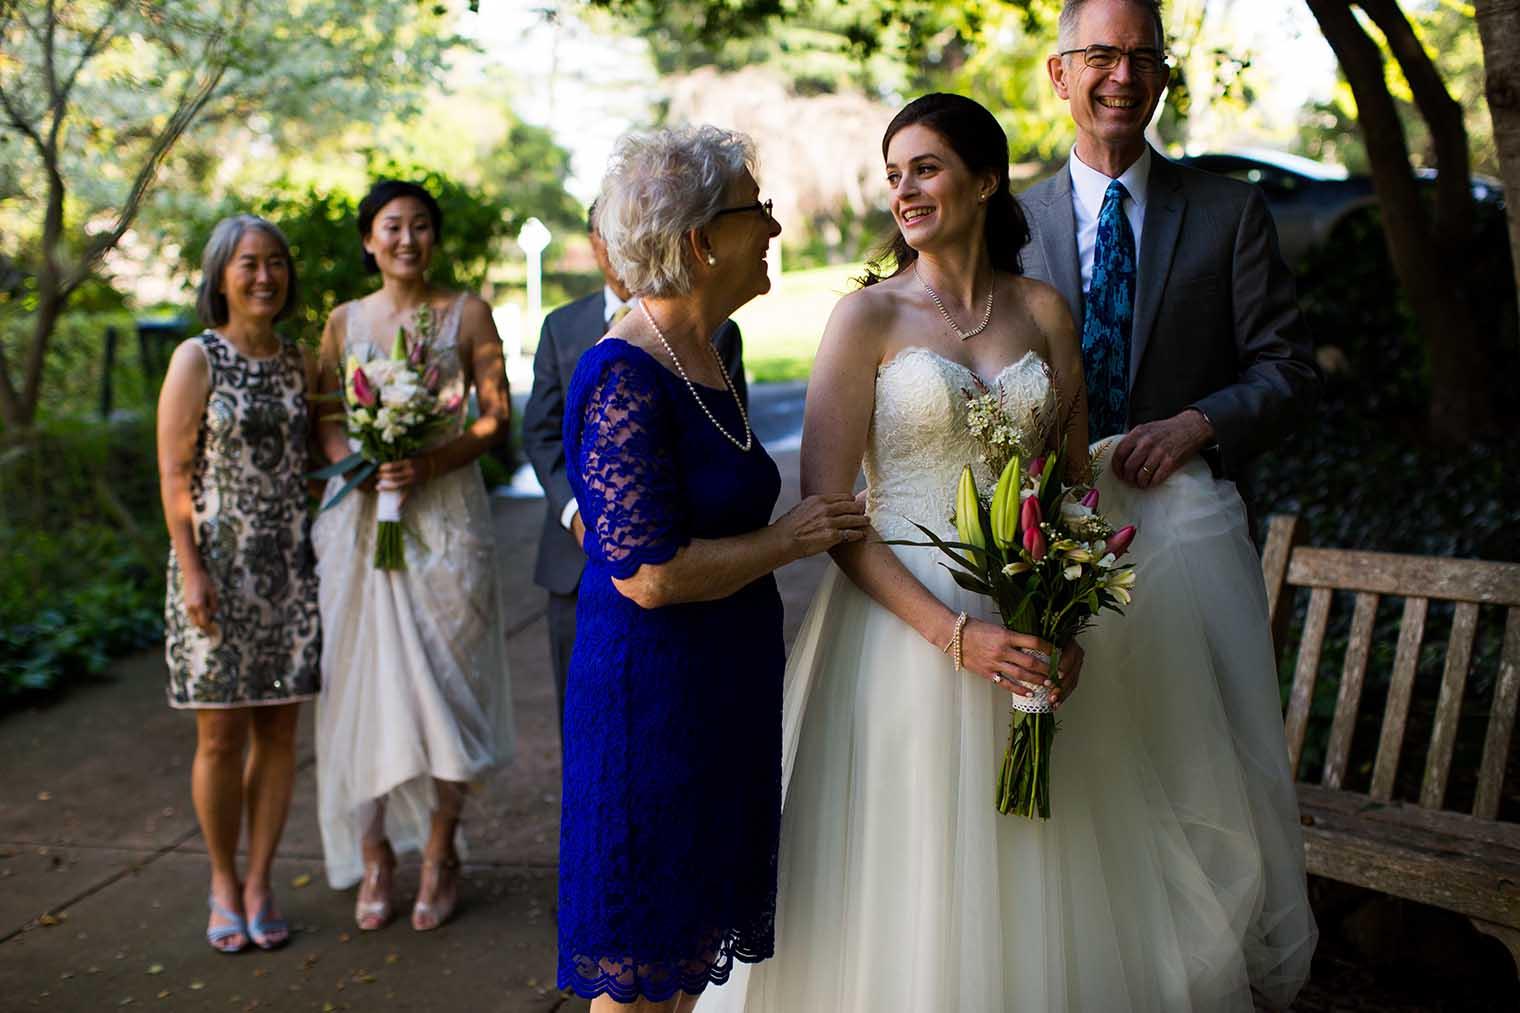 Piedmont Community Hall Wedding Ceremony